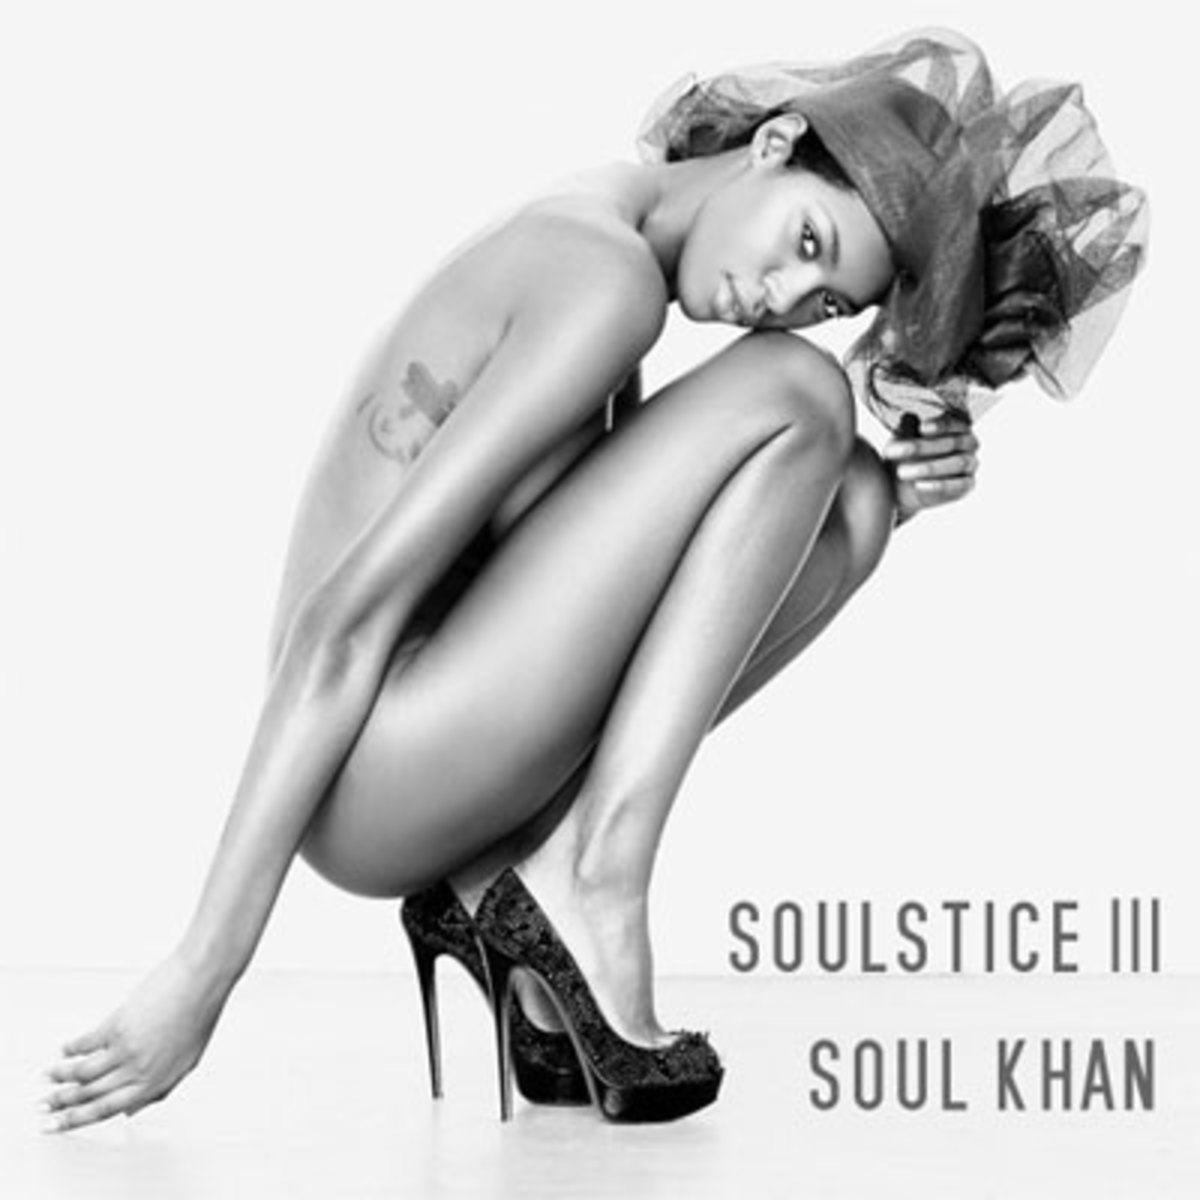 soulkhan-soulstice3.jpg